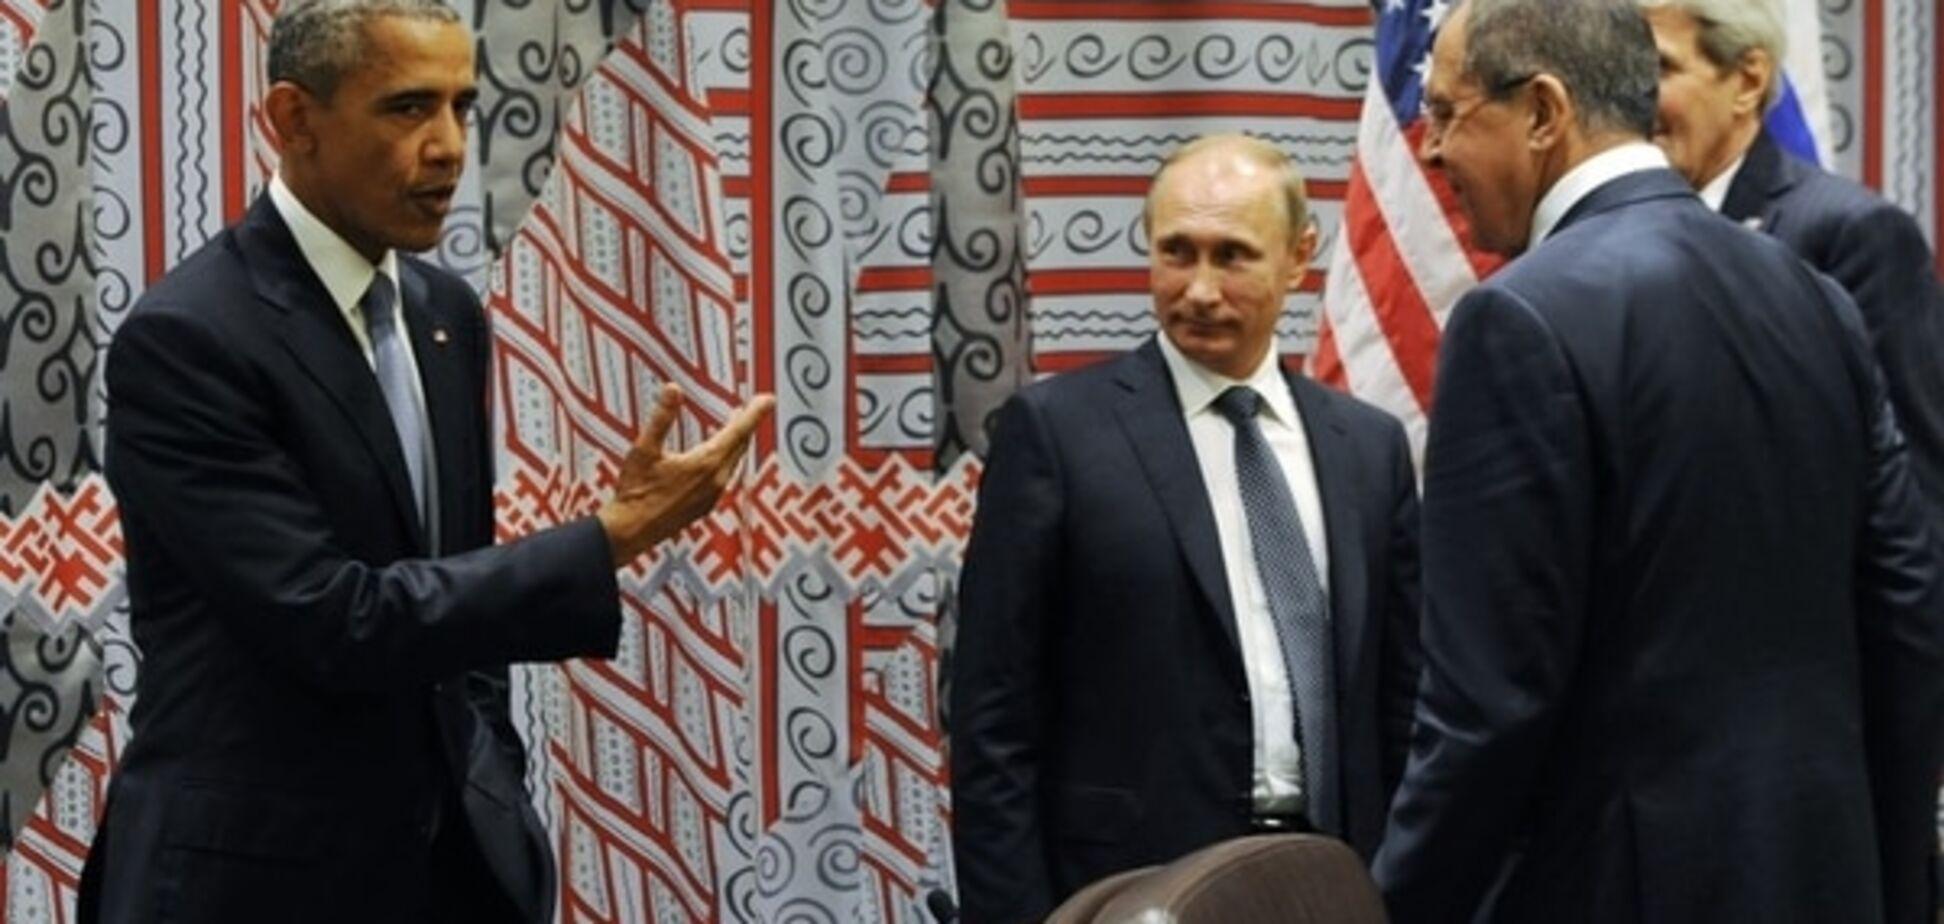 Обама назвал Януковича 'коррумпированной марионеткой Путина'